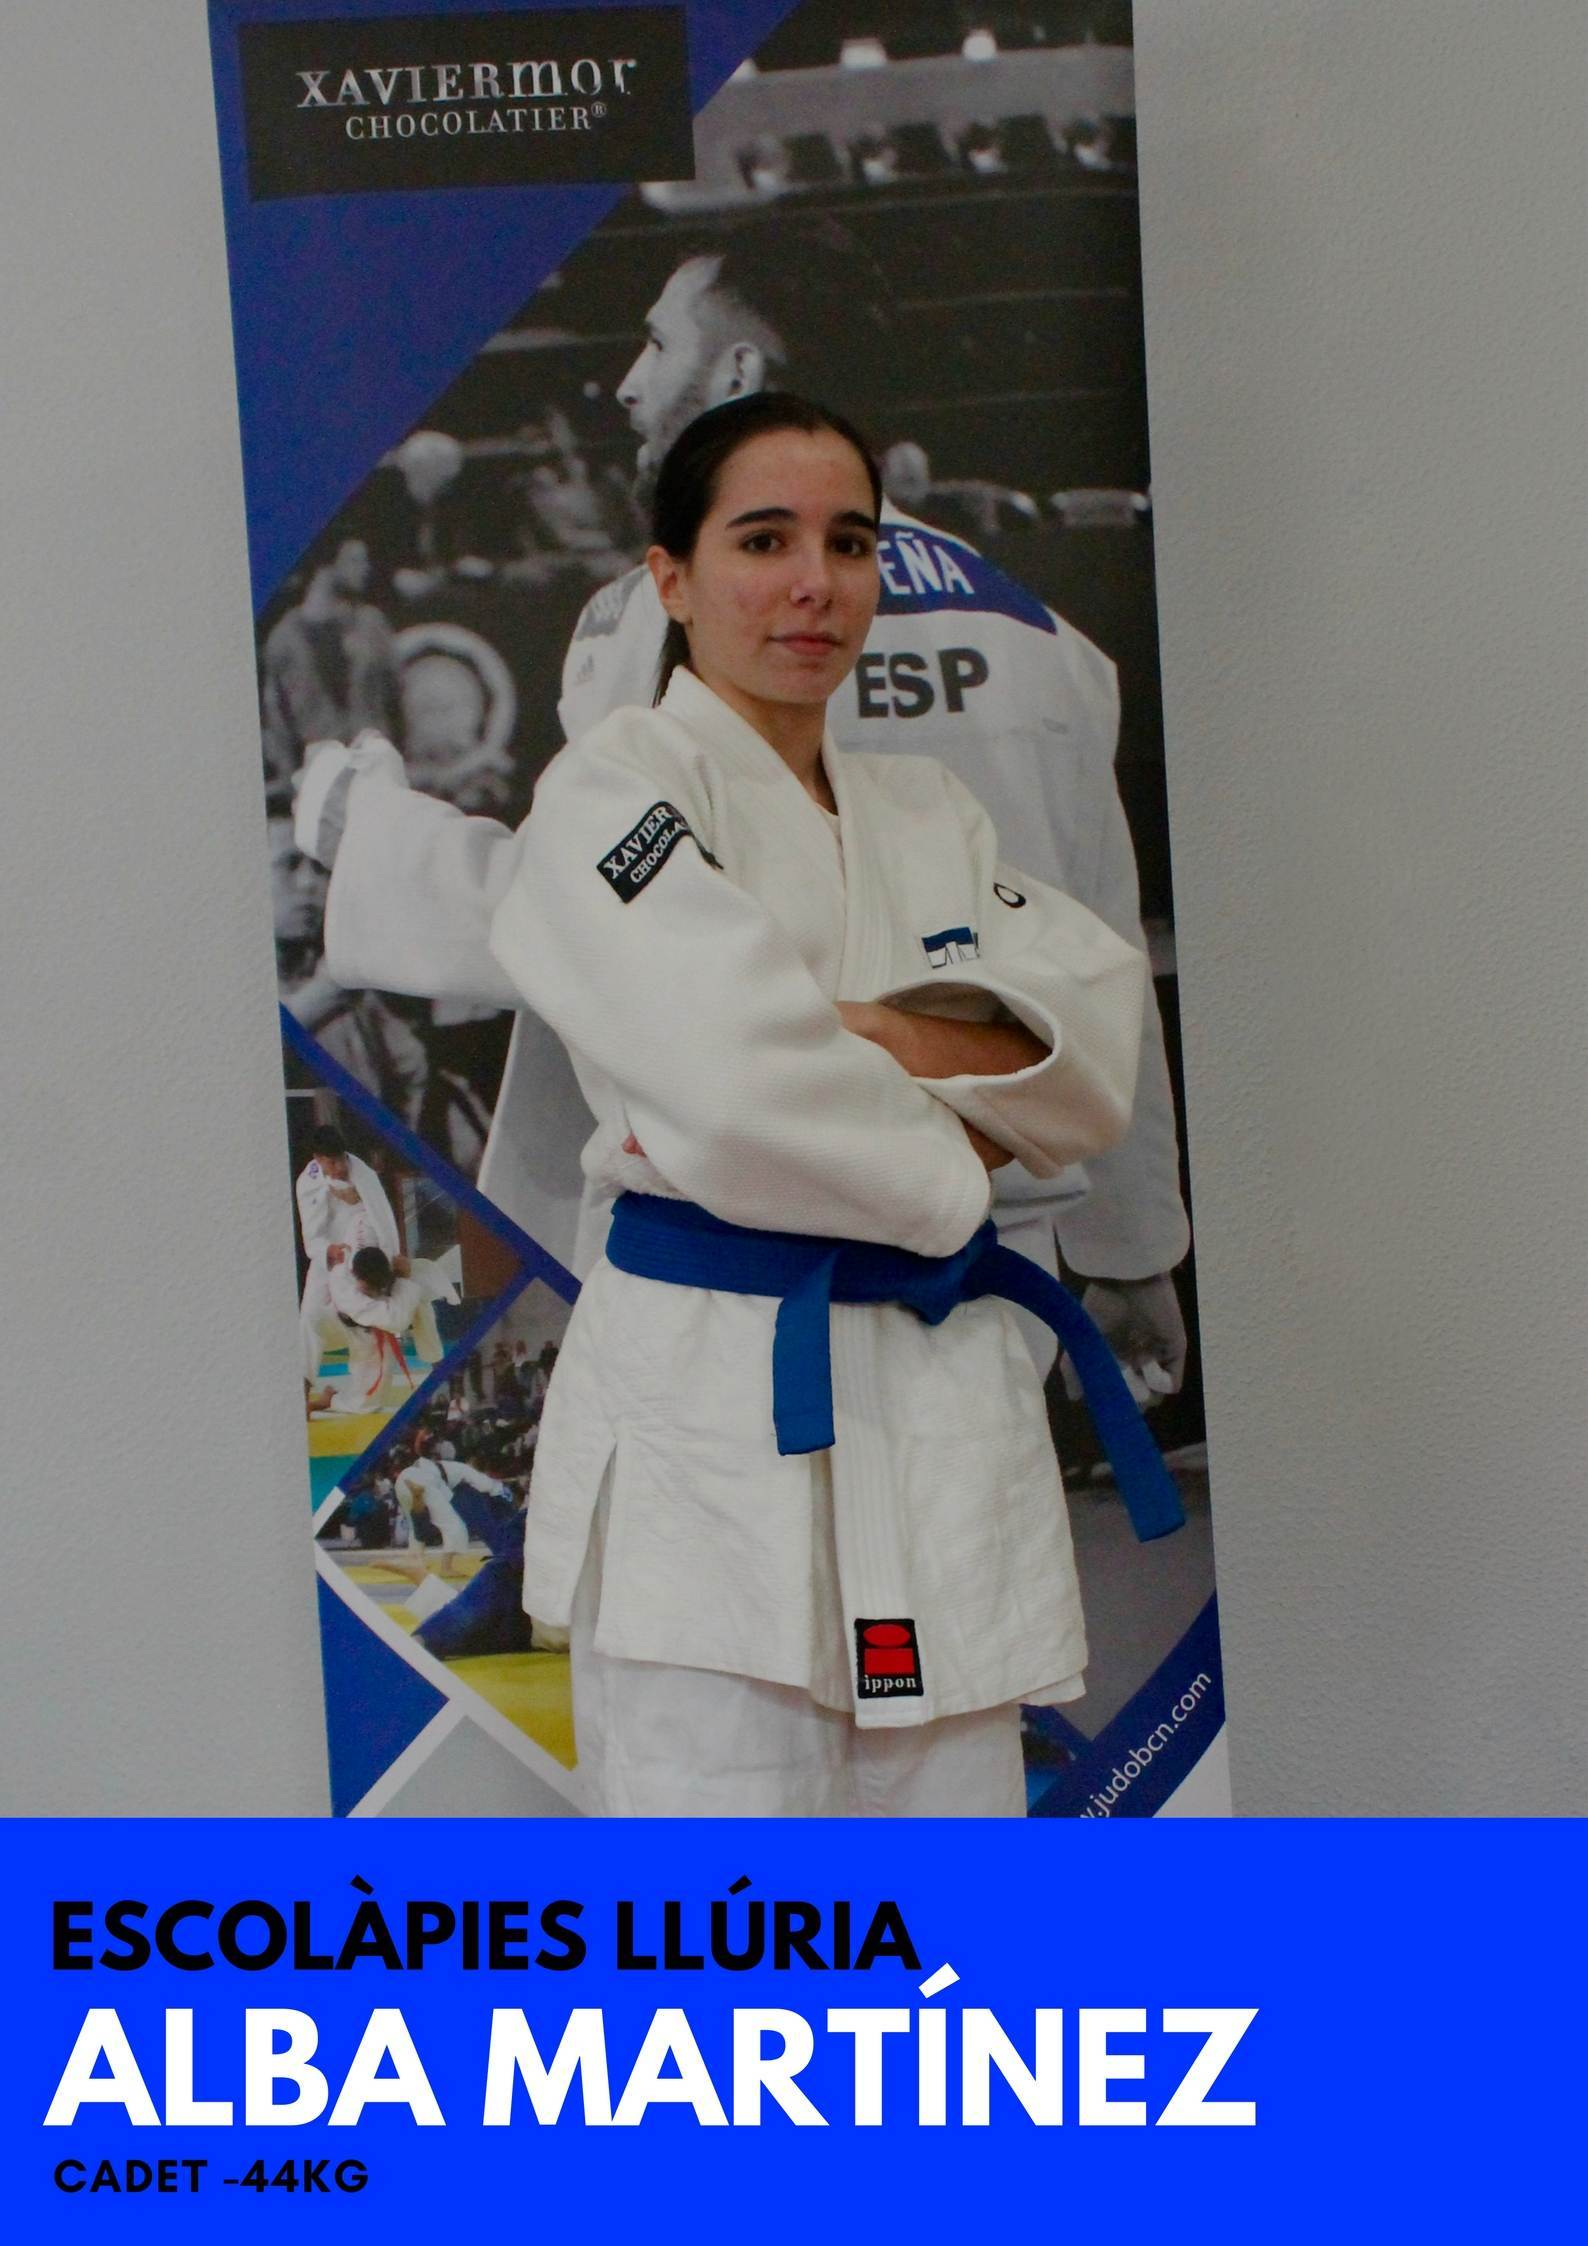 Alba Martínez